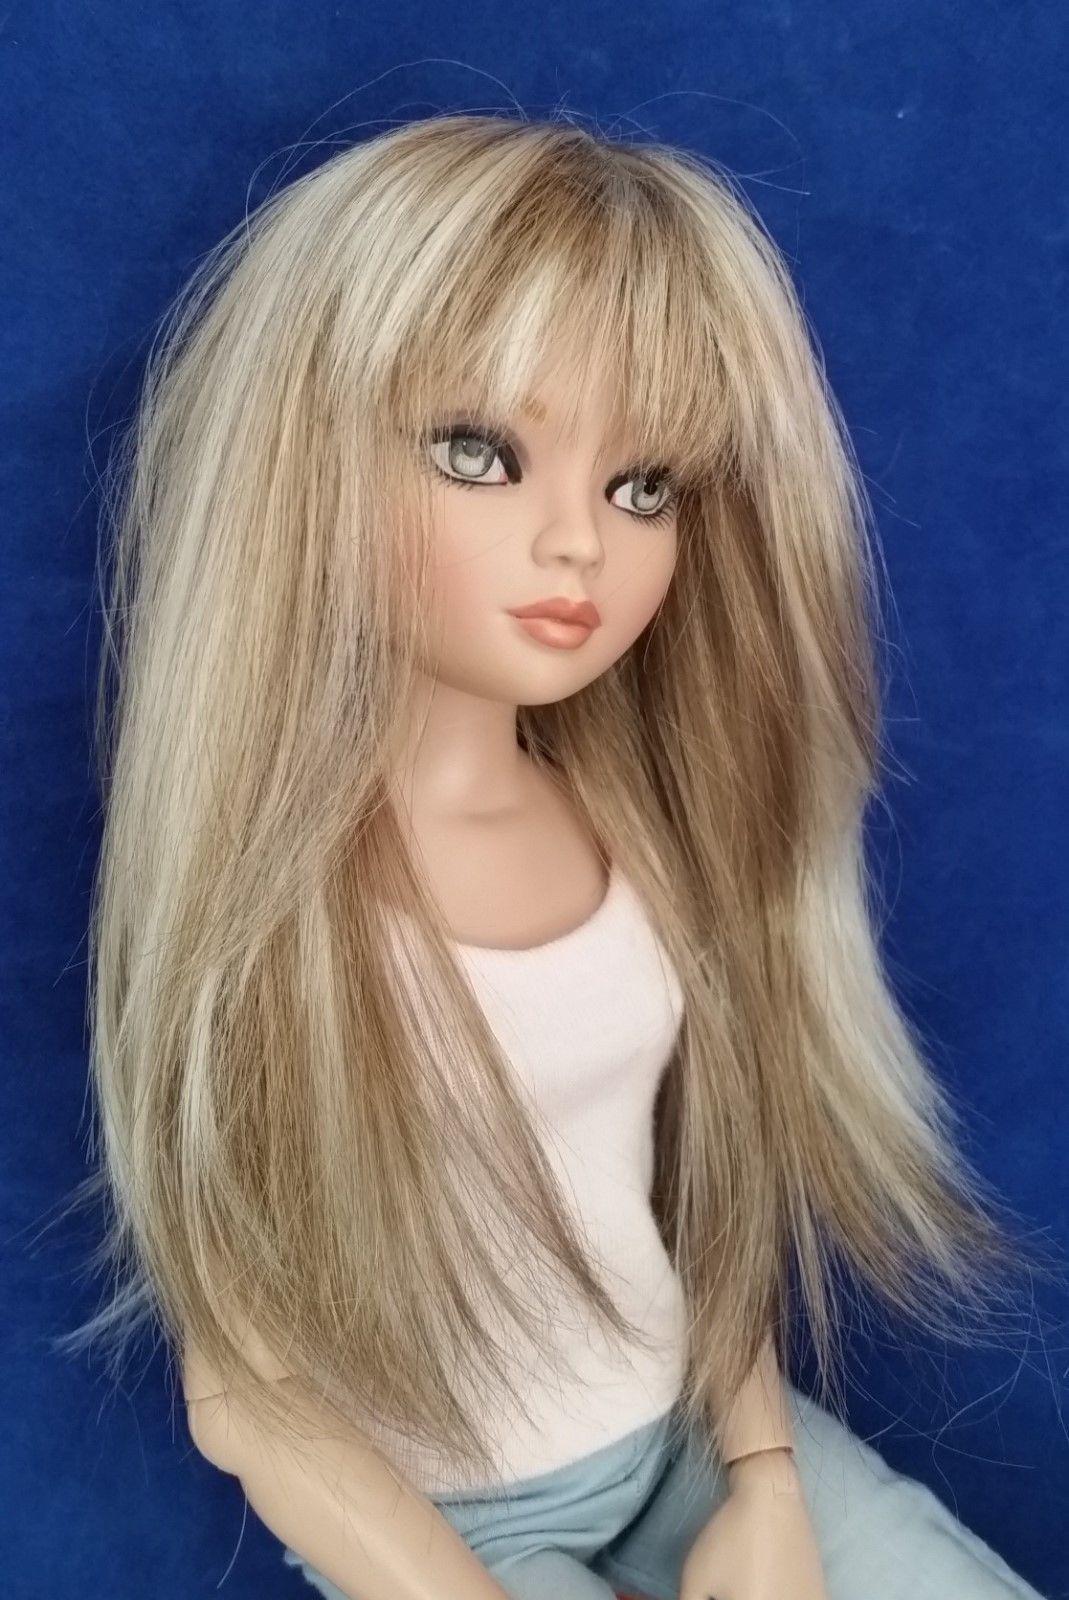 Monique HEART Wig 6//7 for Senson Ellowyne Pukifee Doll Iplehouse REDDISH BLONDE